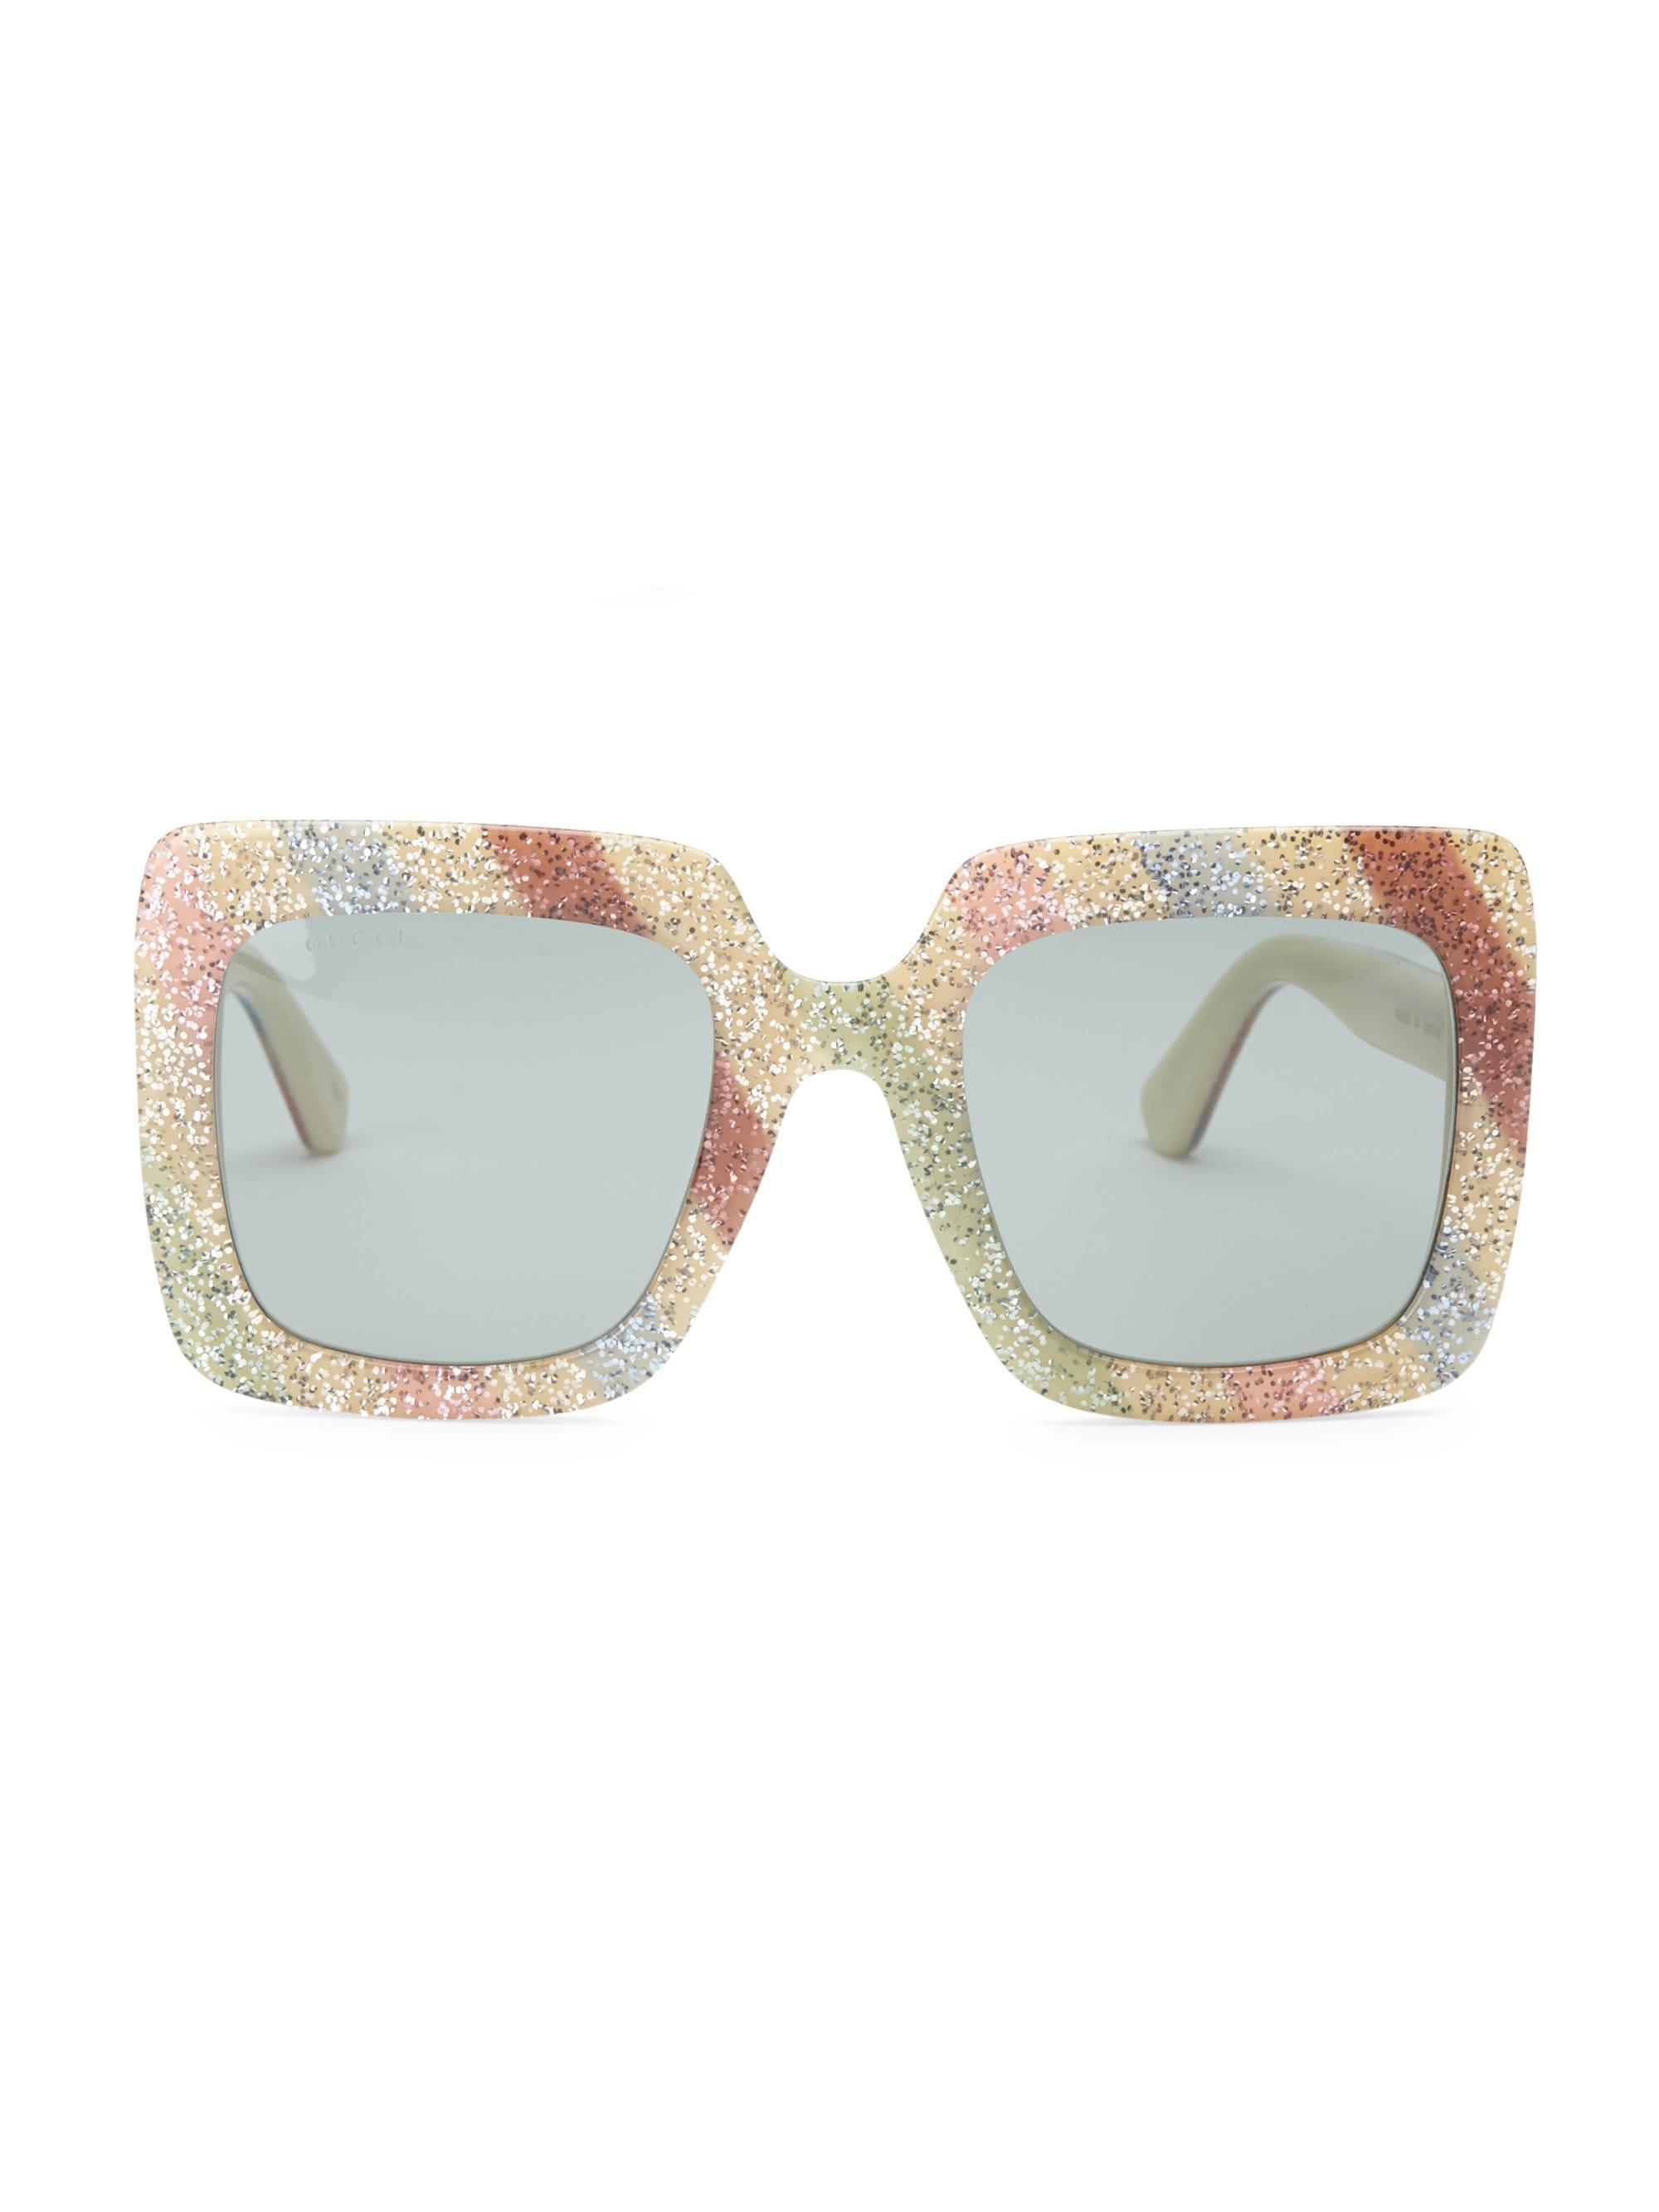 2e469180ba544 Lyst - Gucci Women s White Glitter Oversized Rectangular Sunglasses 53mm